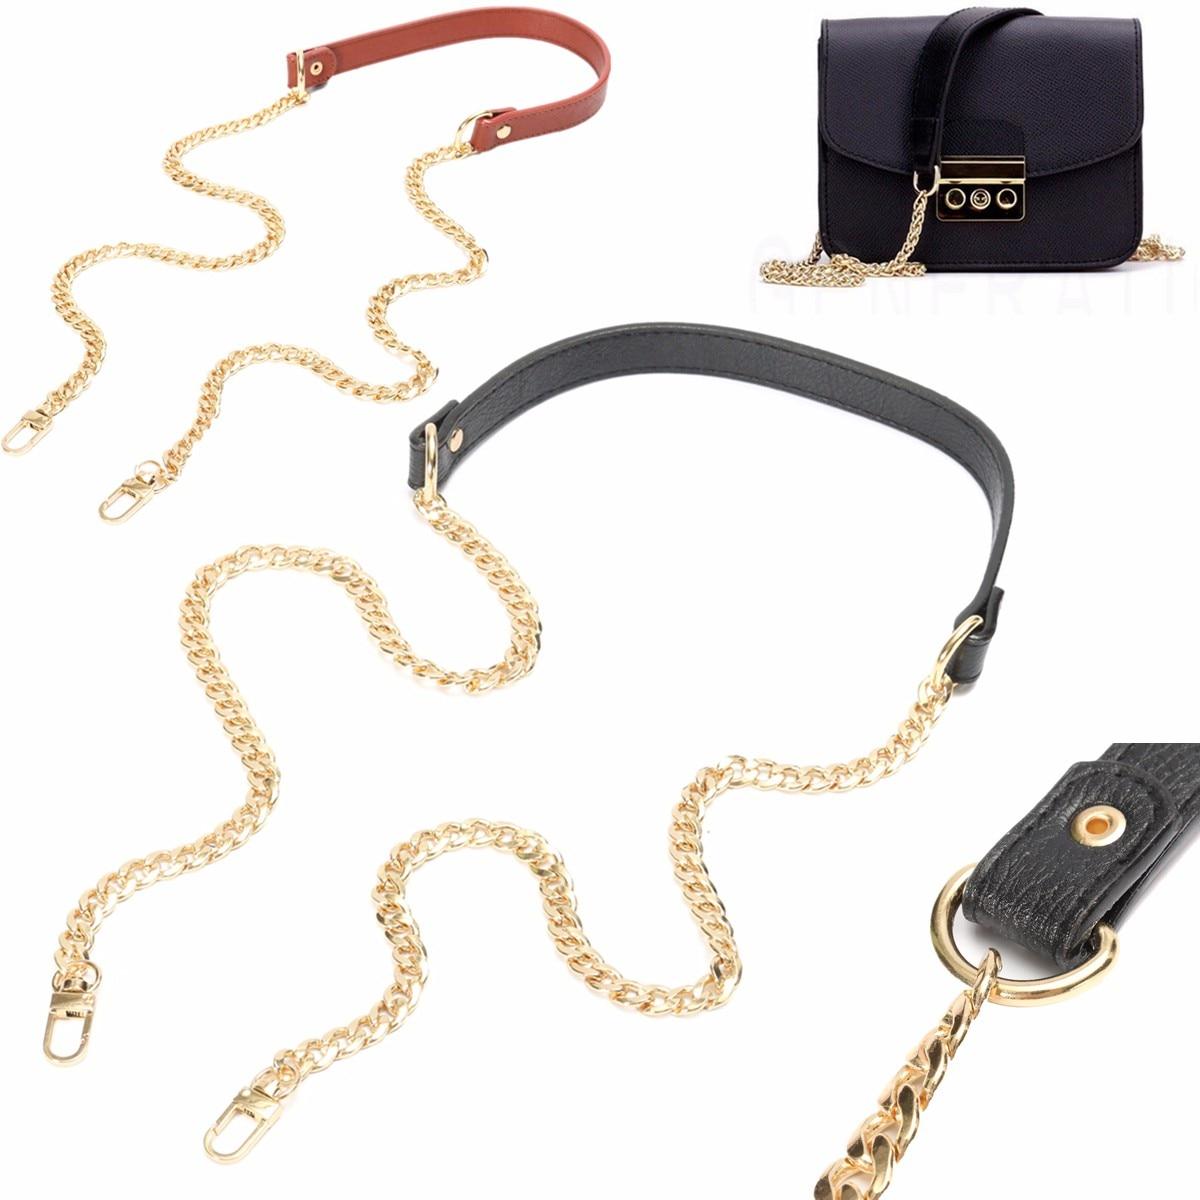 120cm Handbag Metal Chains Strap Purse Chain With Buckles Shoulder Bags Straps Handles Bag Parts Accessories Black Brown In